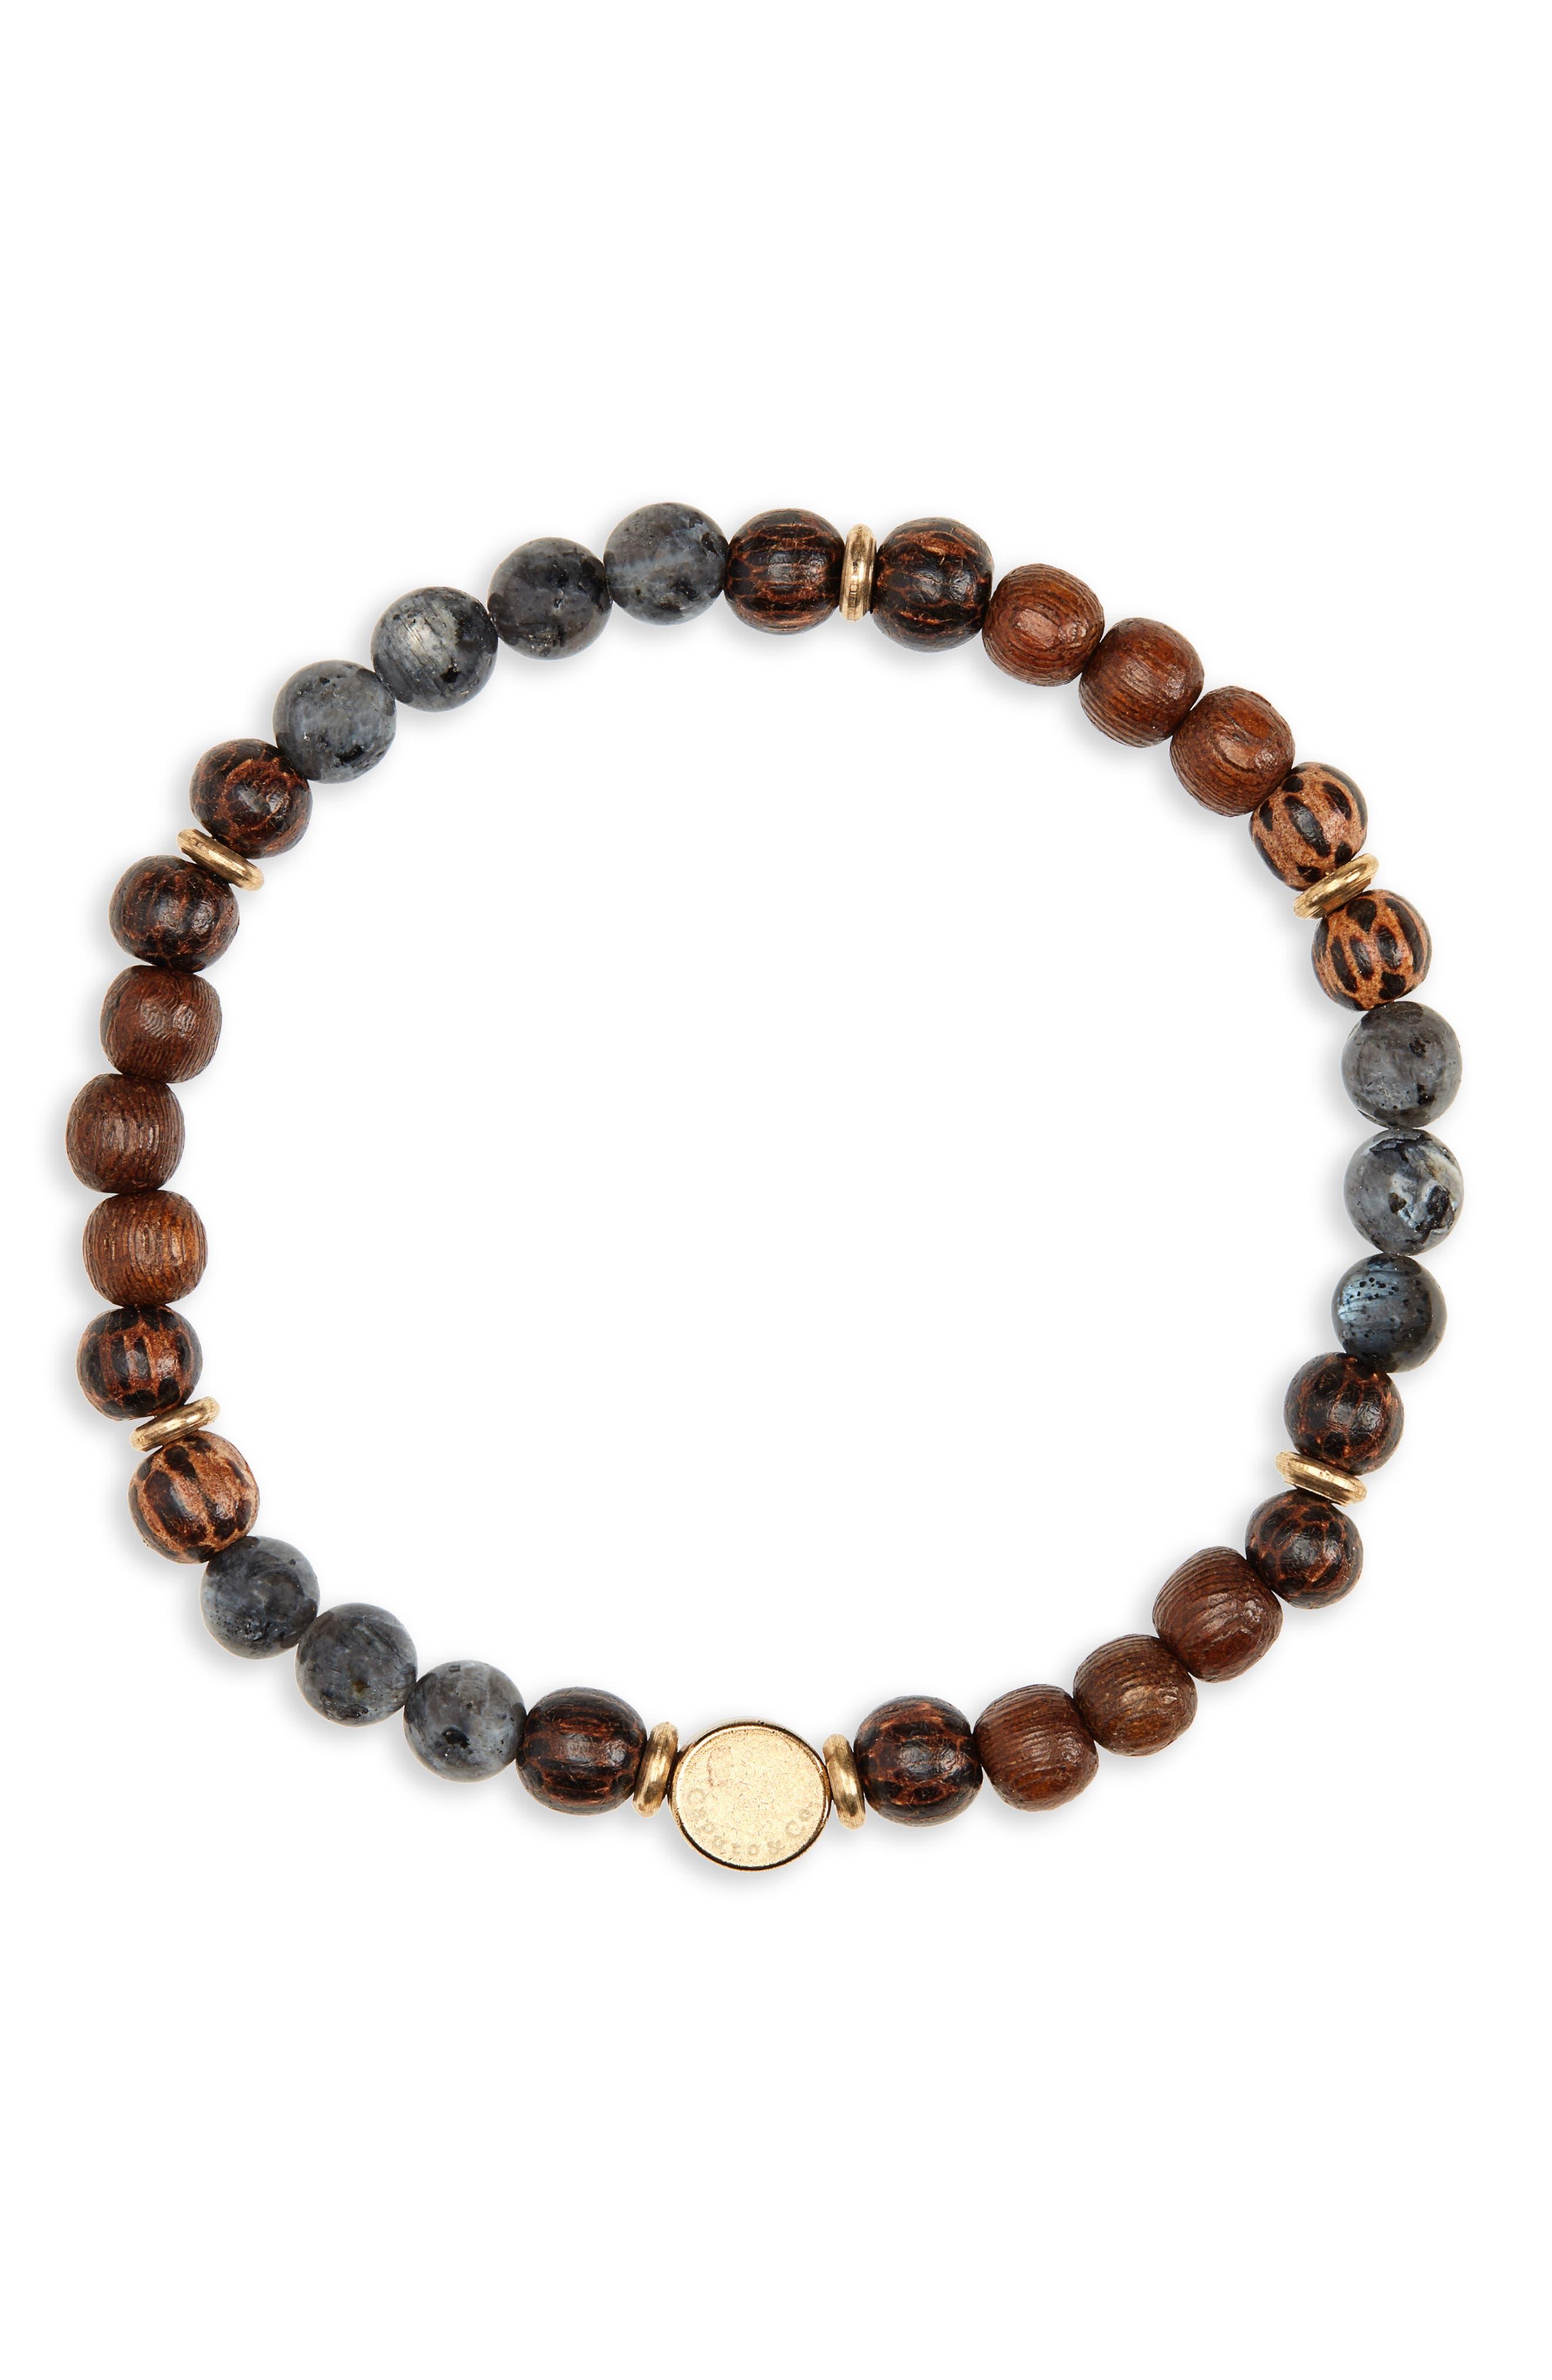 CAPUTO & CO. Stone & Wood Bead Bracelet in Black/ Wood